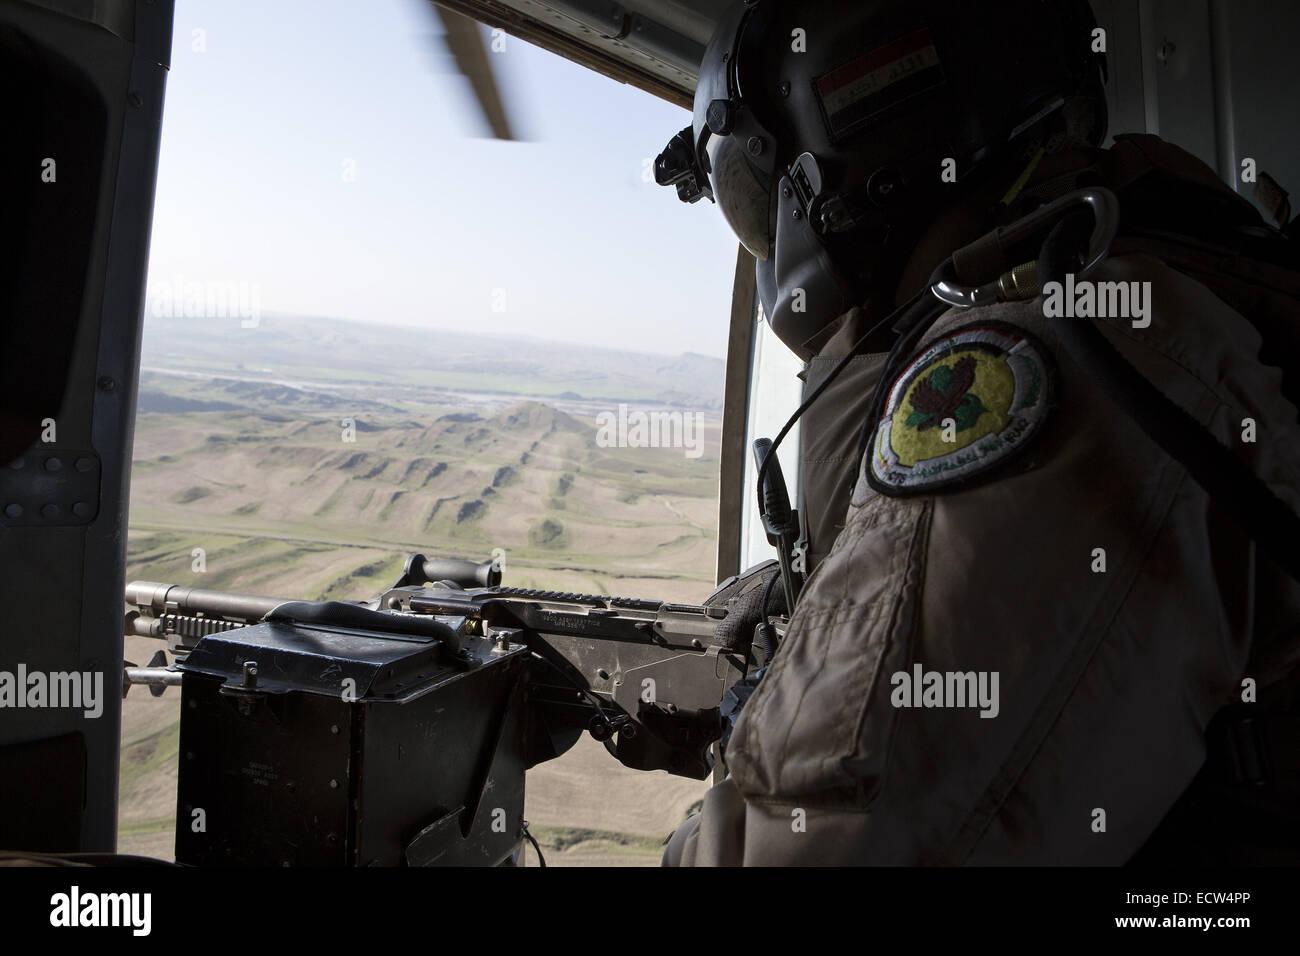 Dec. 11, 2014 - Fishkhabour, Iraqi-Kurdistan, Iraq - 11/12/2014. Fishkhabour, Iraq. The door gunner of an Iraqi - Stock Image